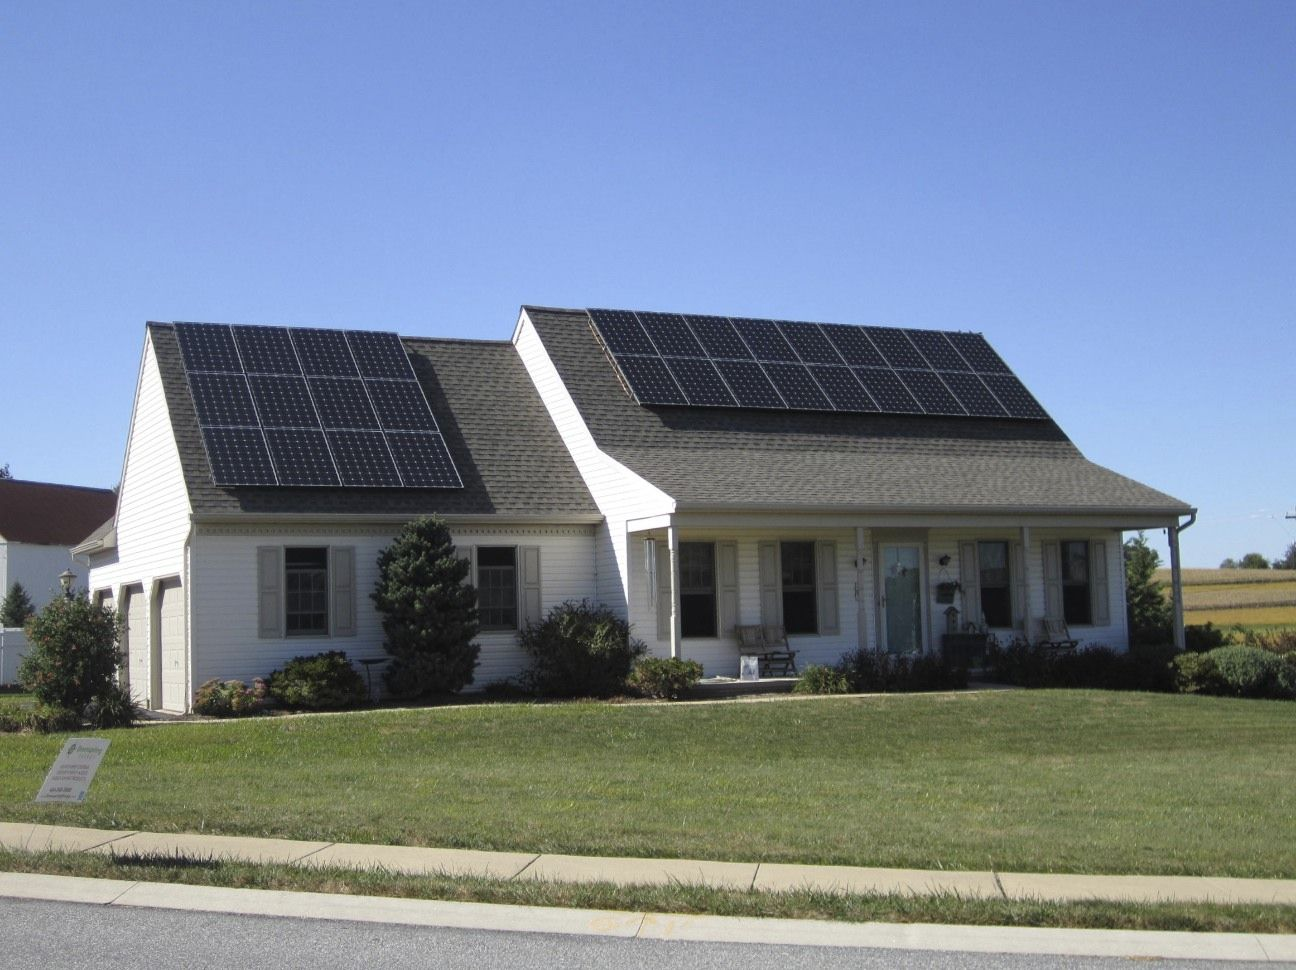 Residential Solar Panel Installation Gallery Pennsylvania, New jersey,  Maryland, Delaware, … | Residential solar panels, Residential solar, Solar  panel installation